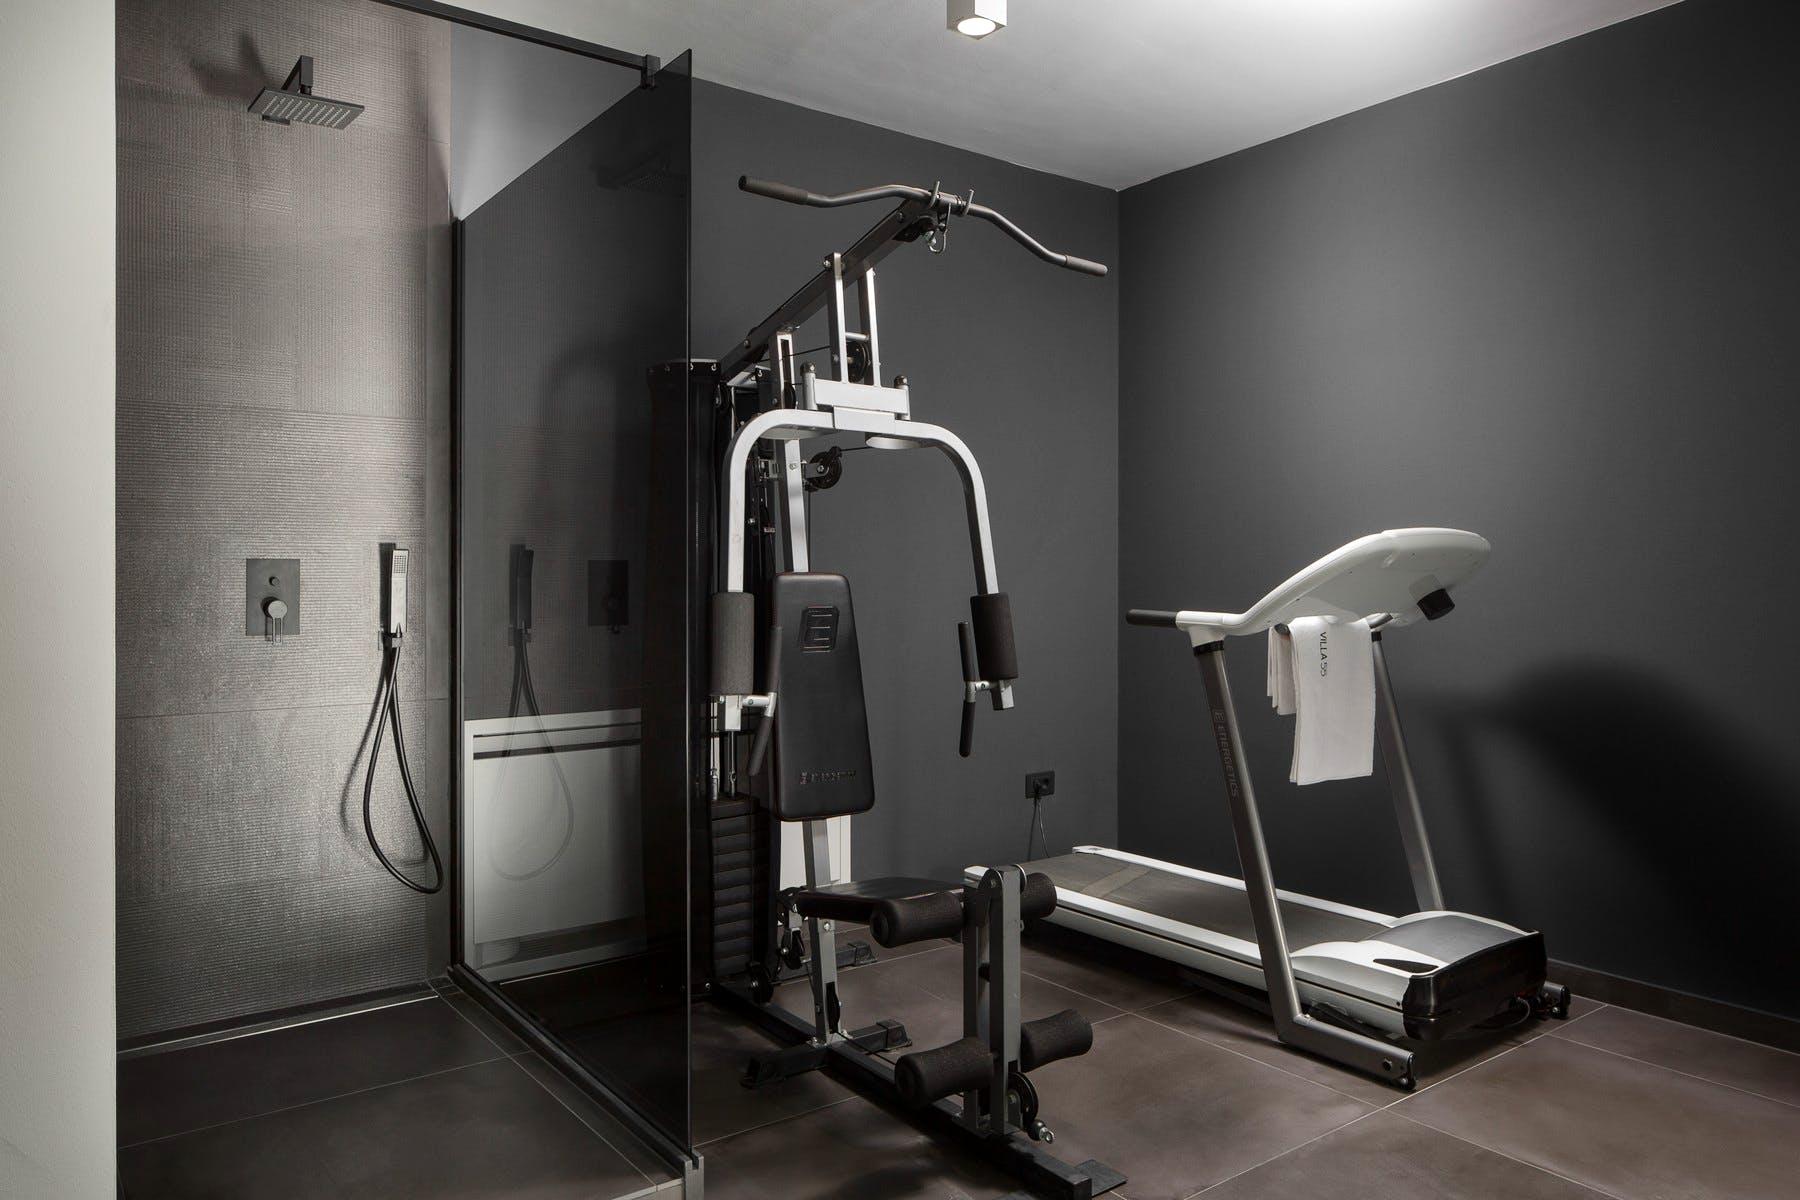 Modern gym area in the lower ground floor